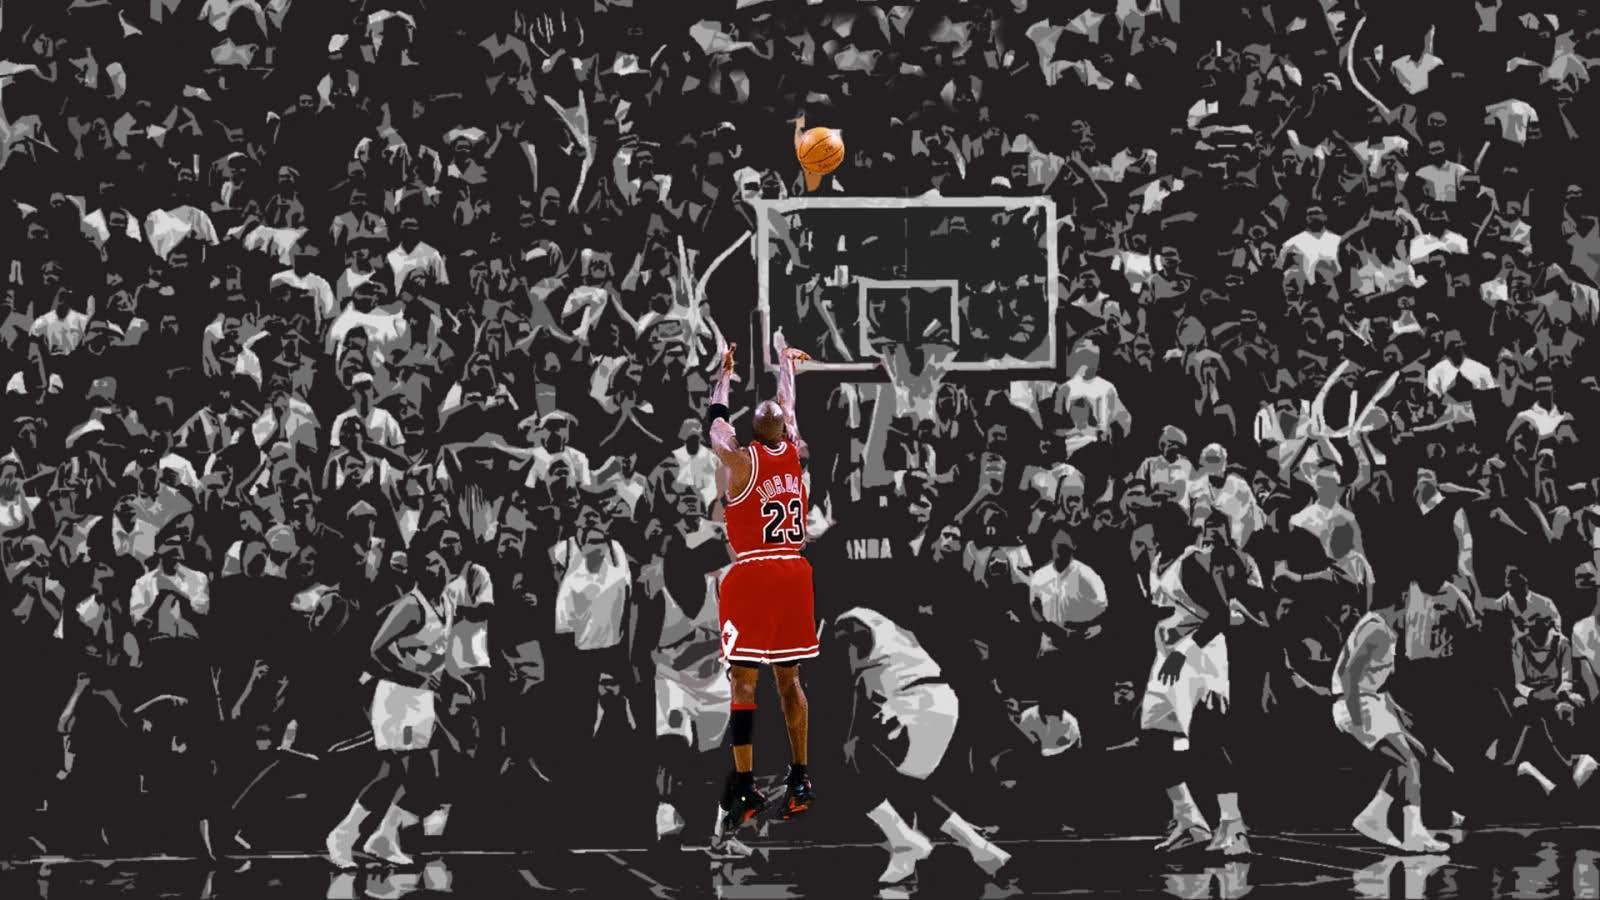 michael jordan wallpaper - photo #11